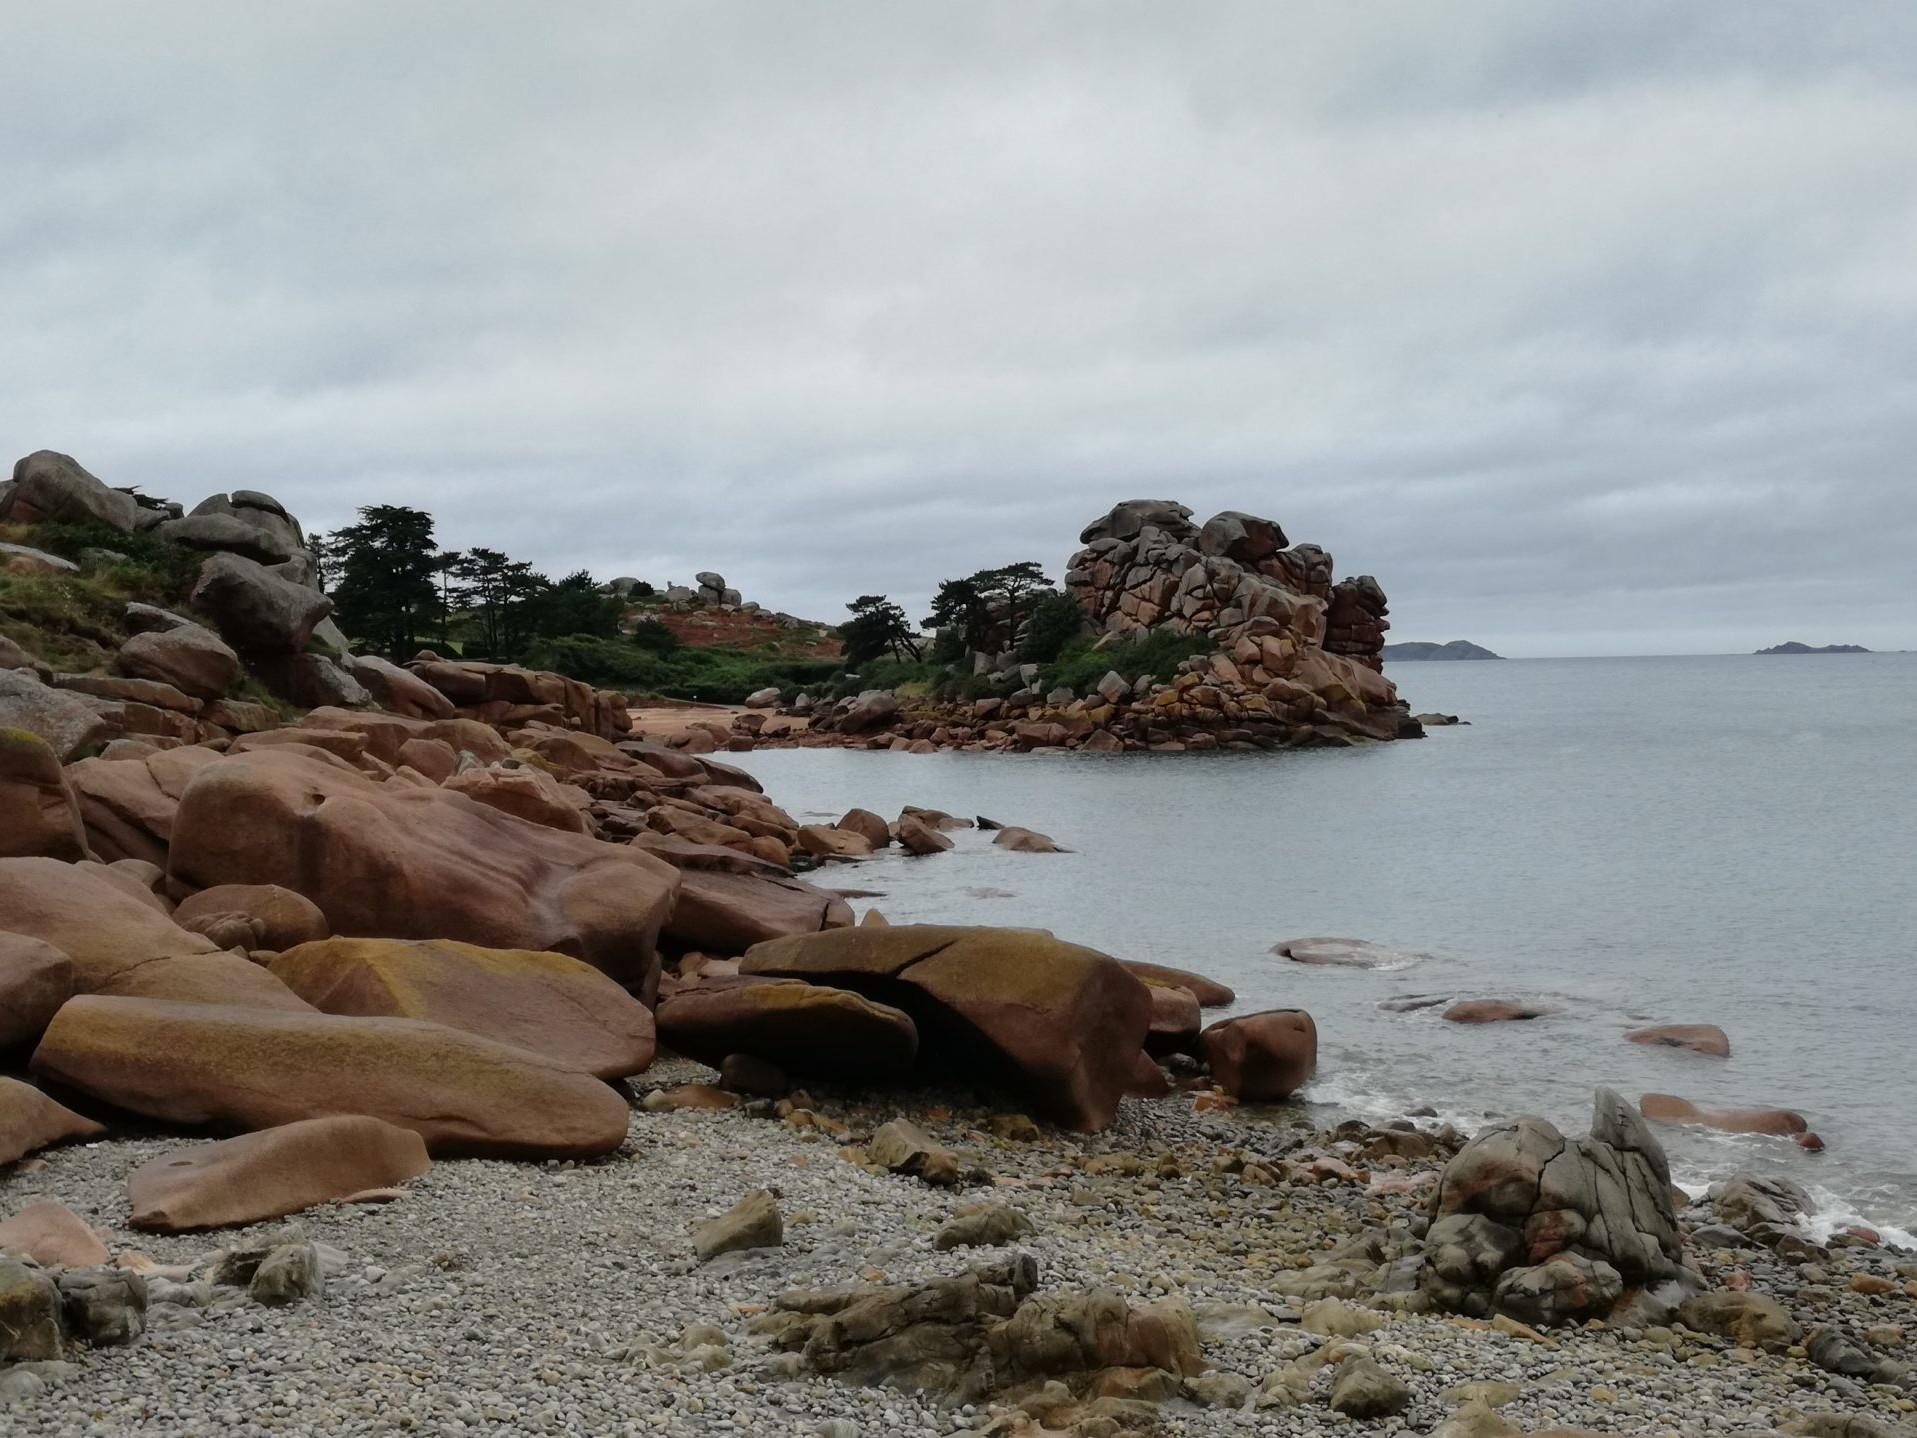 Un grand classique, la côte de Granit Rose